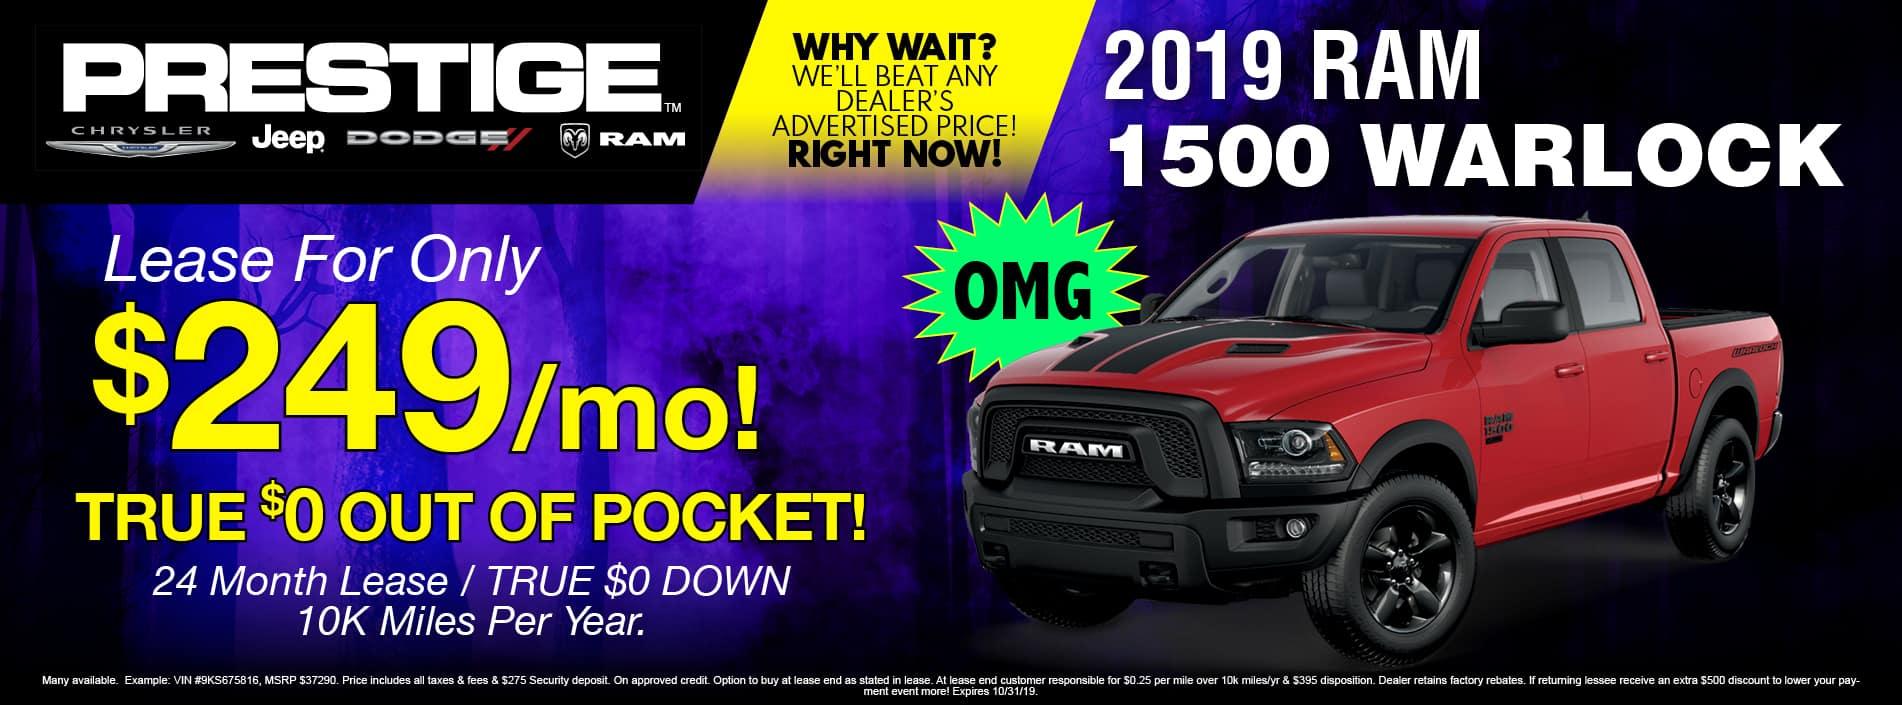 Dodge Dealership Las Vegas >> Prestige Chrysler Jeep Dodge Llc Cdjr Dealer In Las Vegas Nv